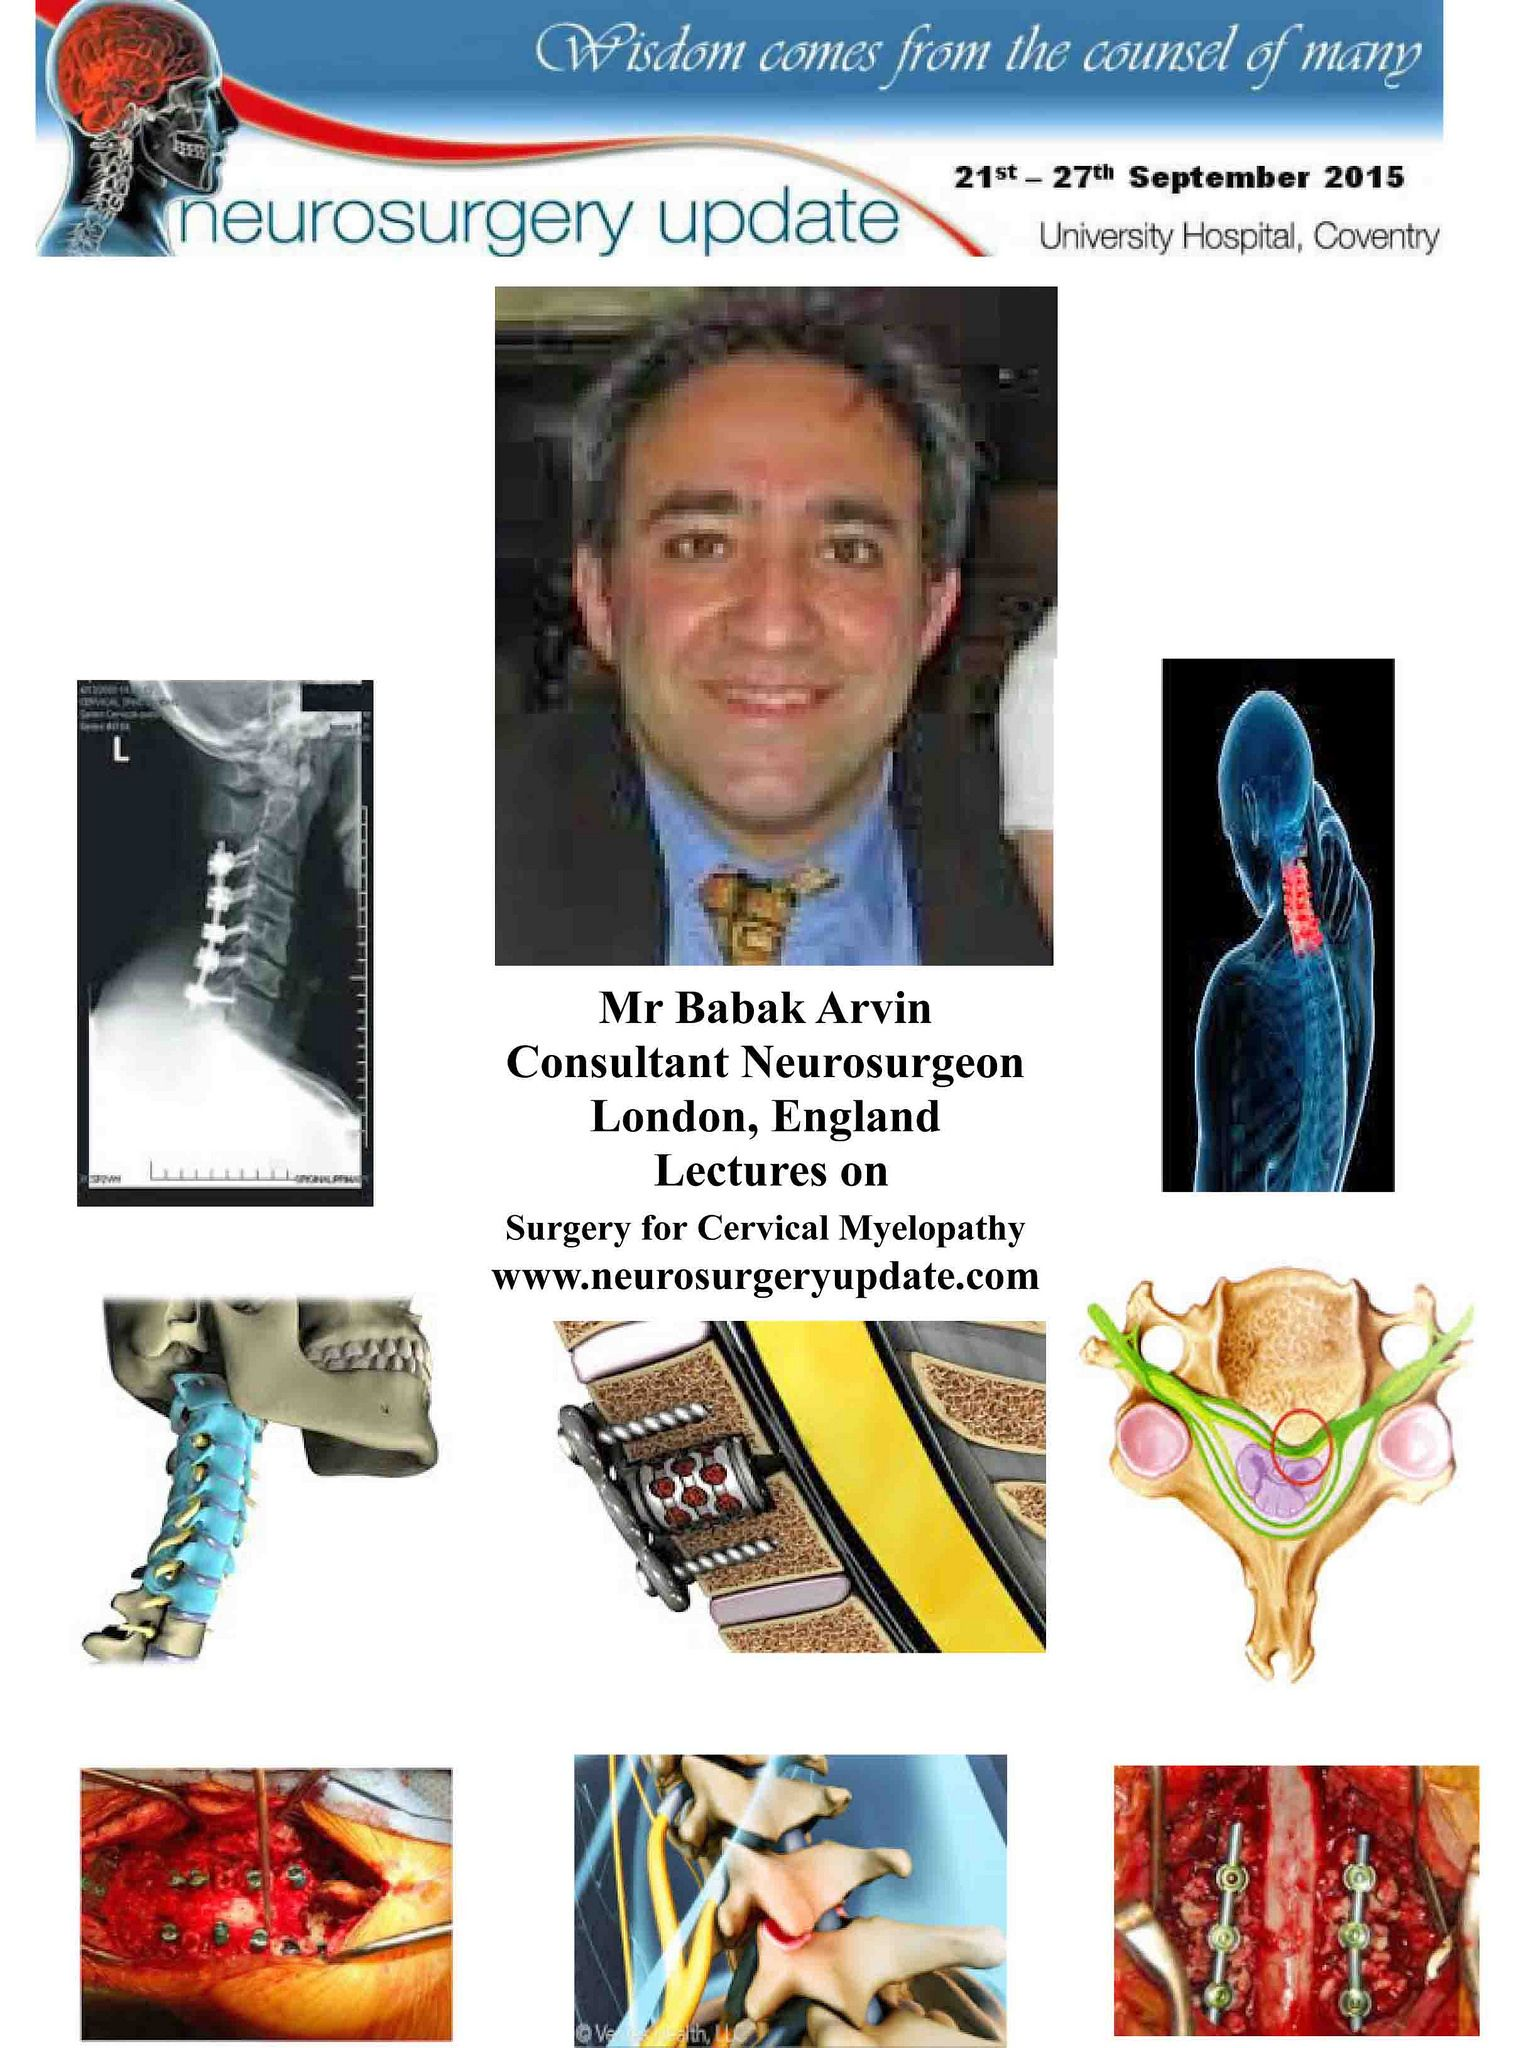 Babak Arvin 2015 Neurosurgery Update | Neurosurgery Update